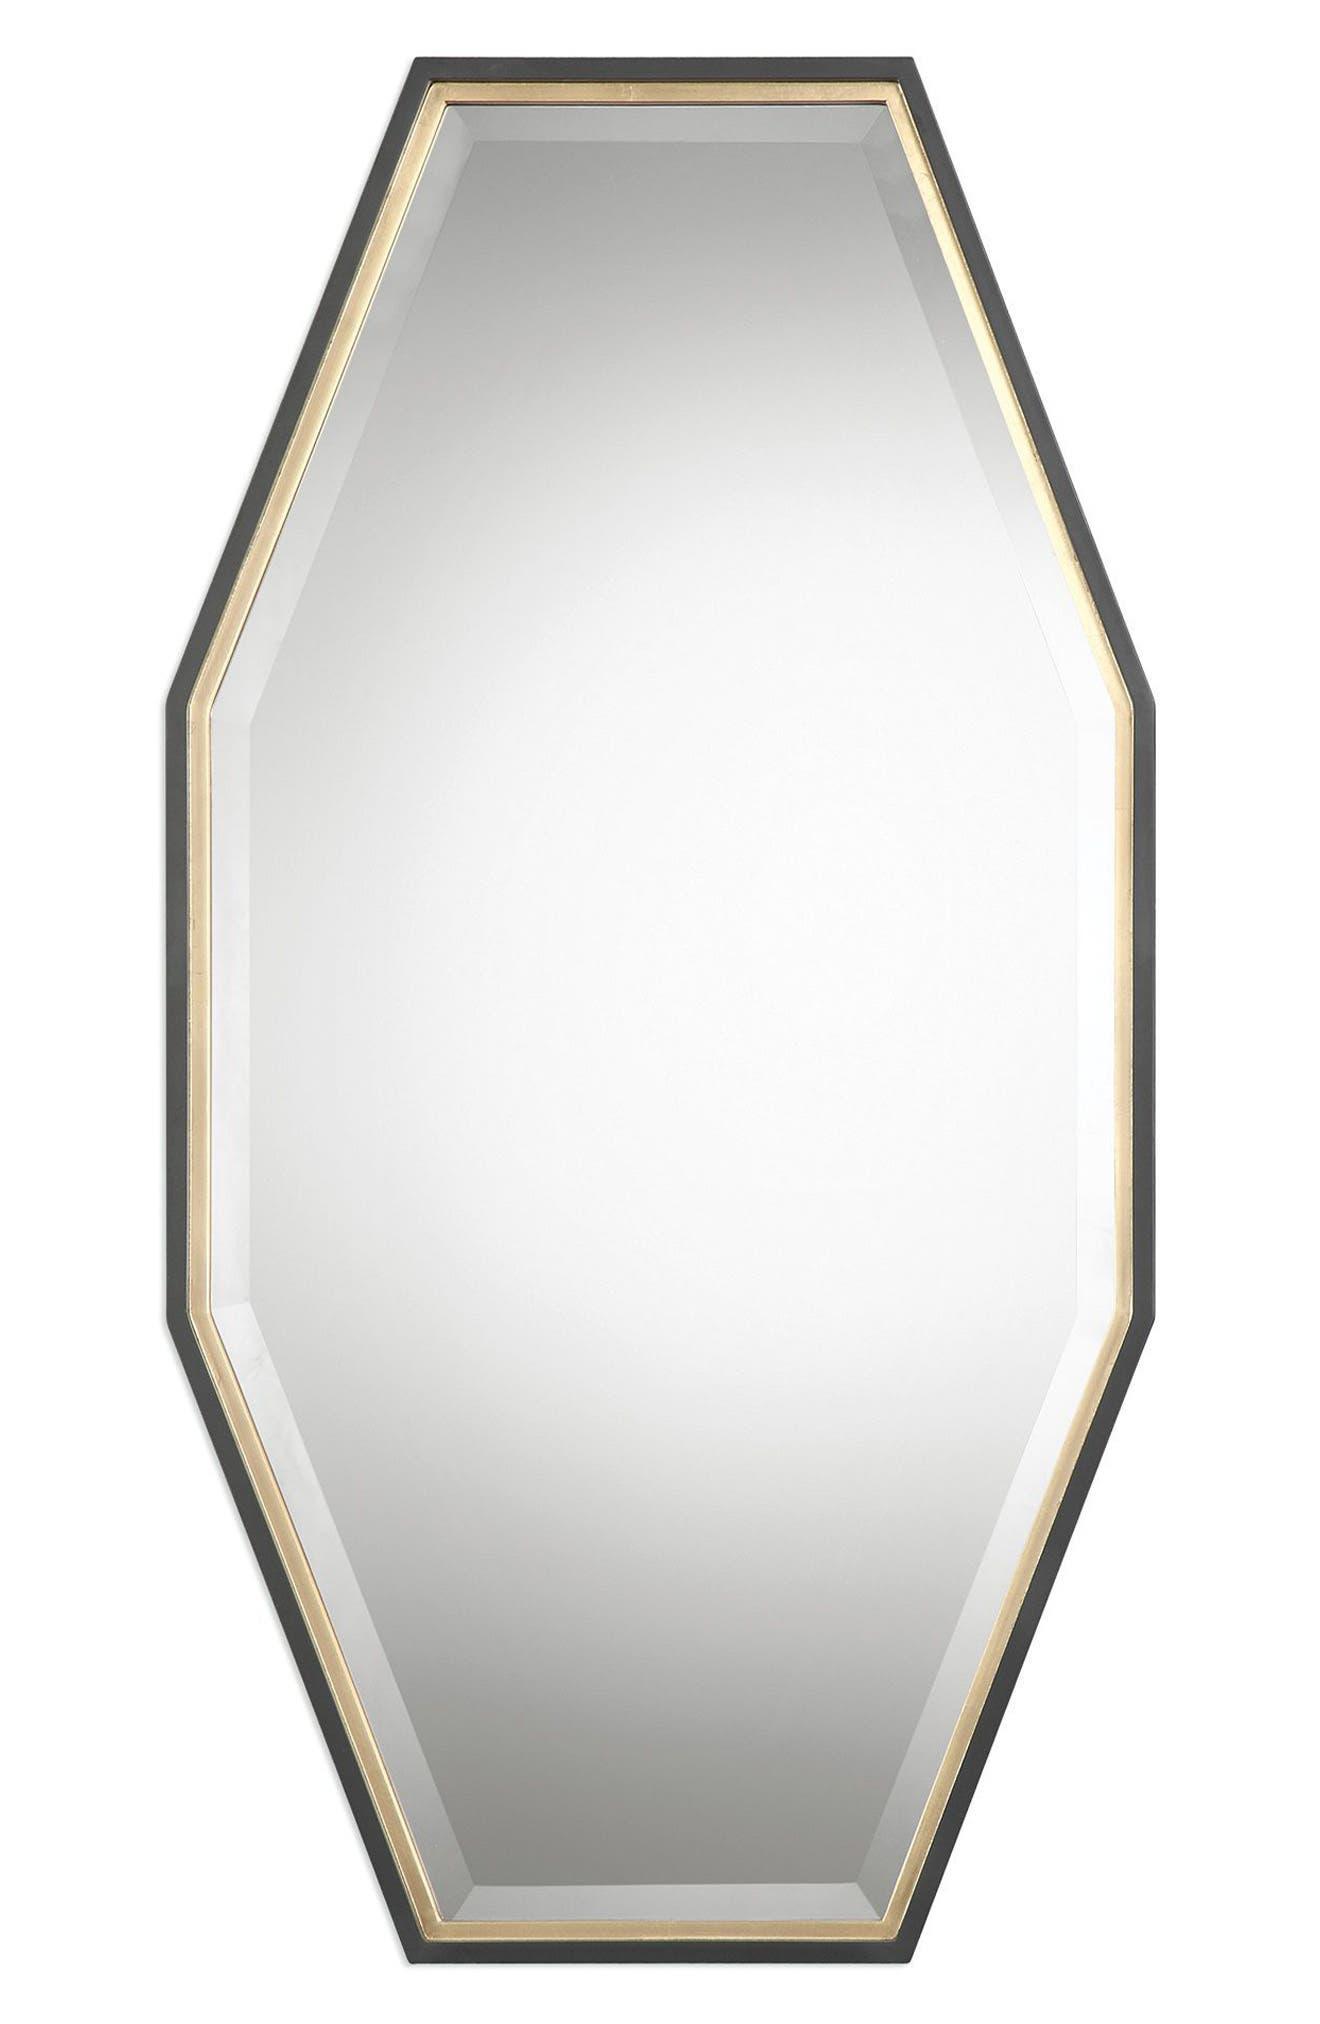 Uttermost Savion Wall Mirror